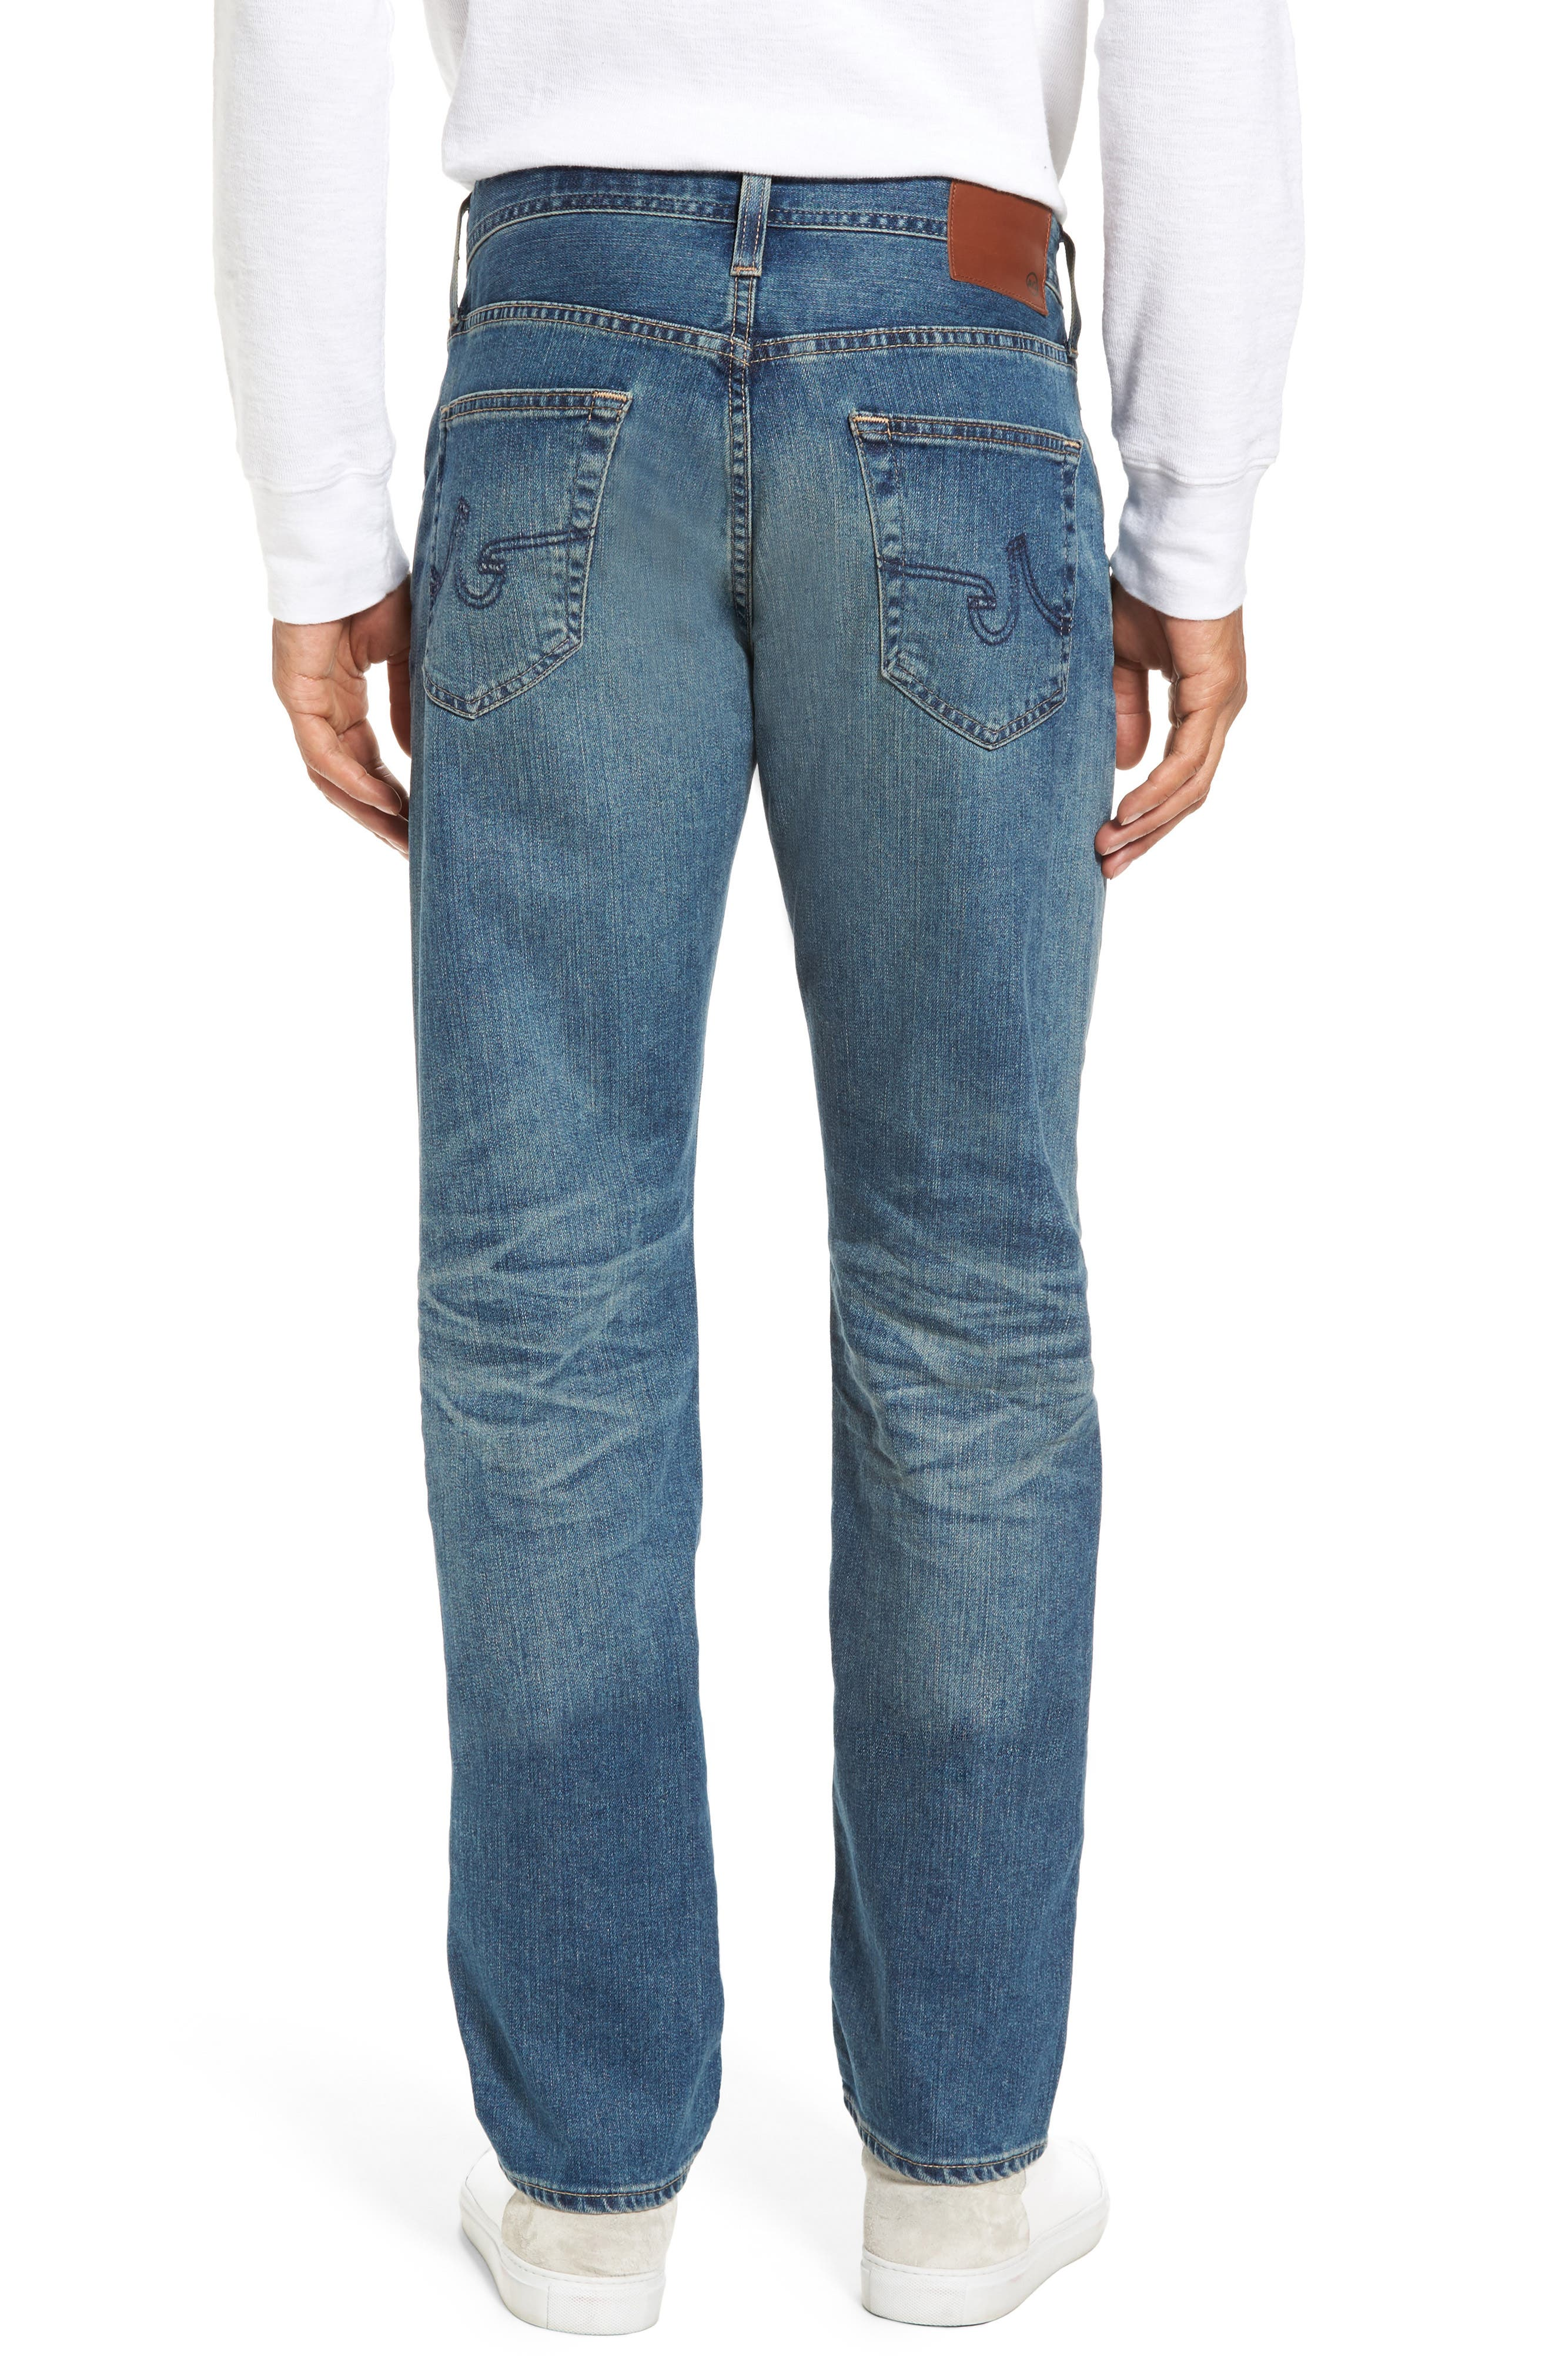 Graduate Slim Straight Leg Jeans,                             Alternate thumbnail 2, color,                             430